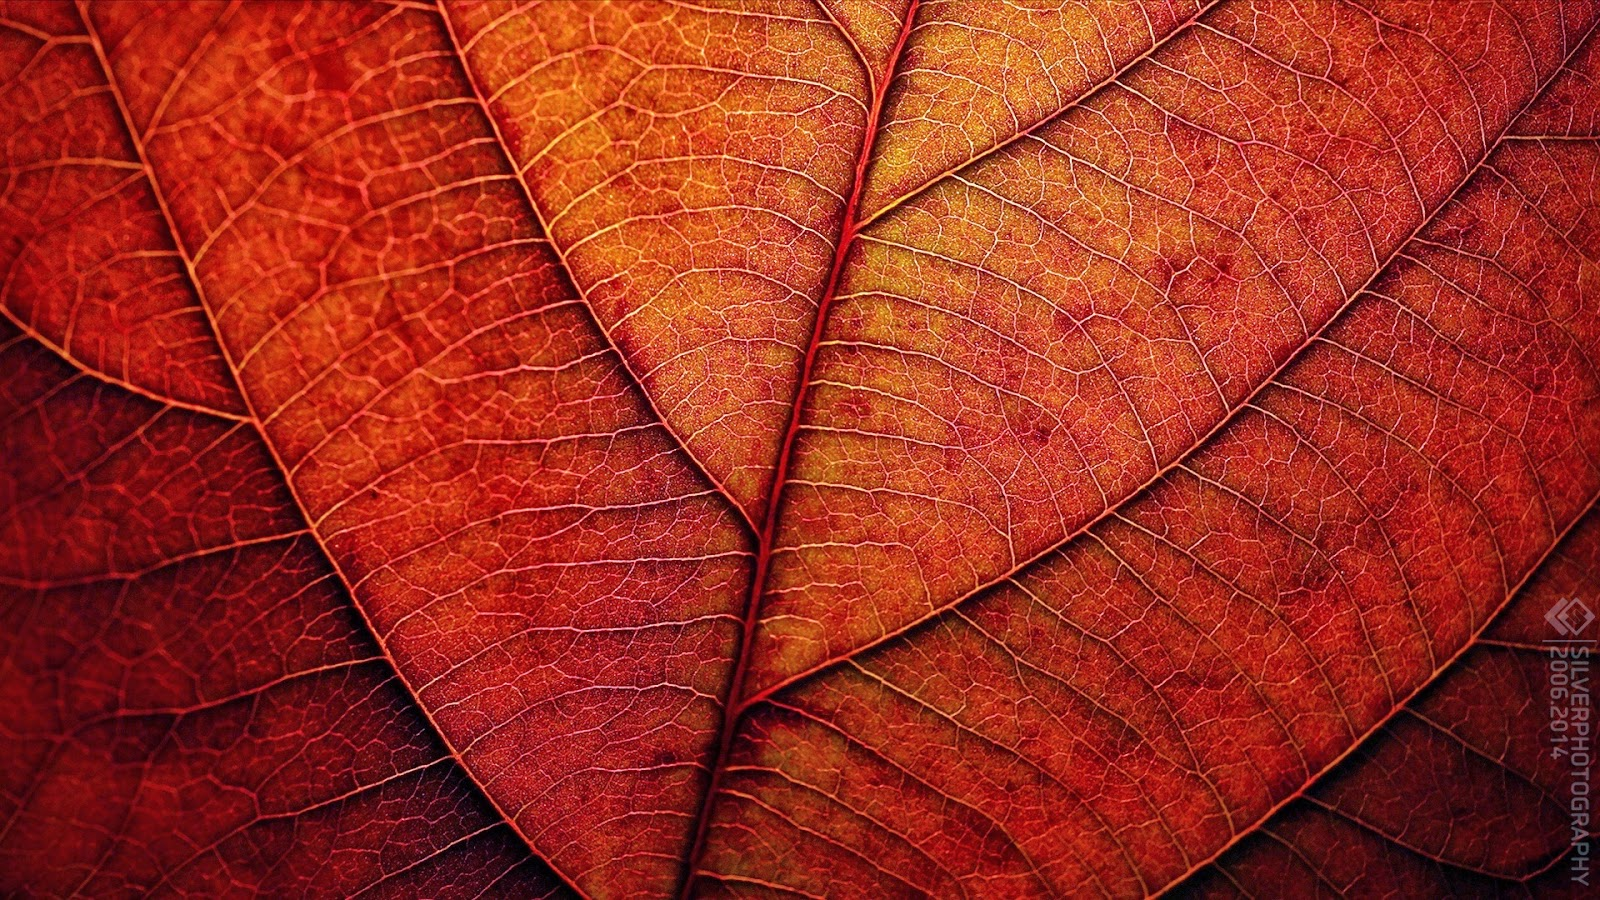 Wallpaper San Valentin 3d Texturas De Hojas Para Photoshop Fotos E Im 225 Genes En